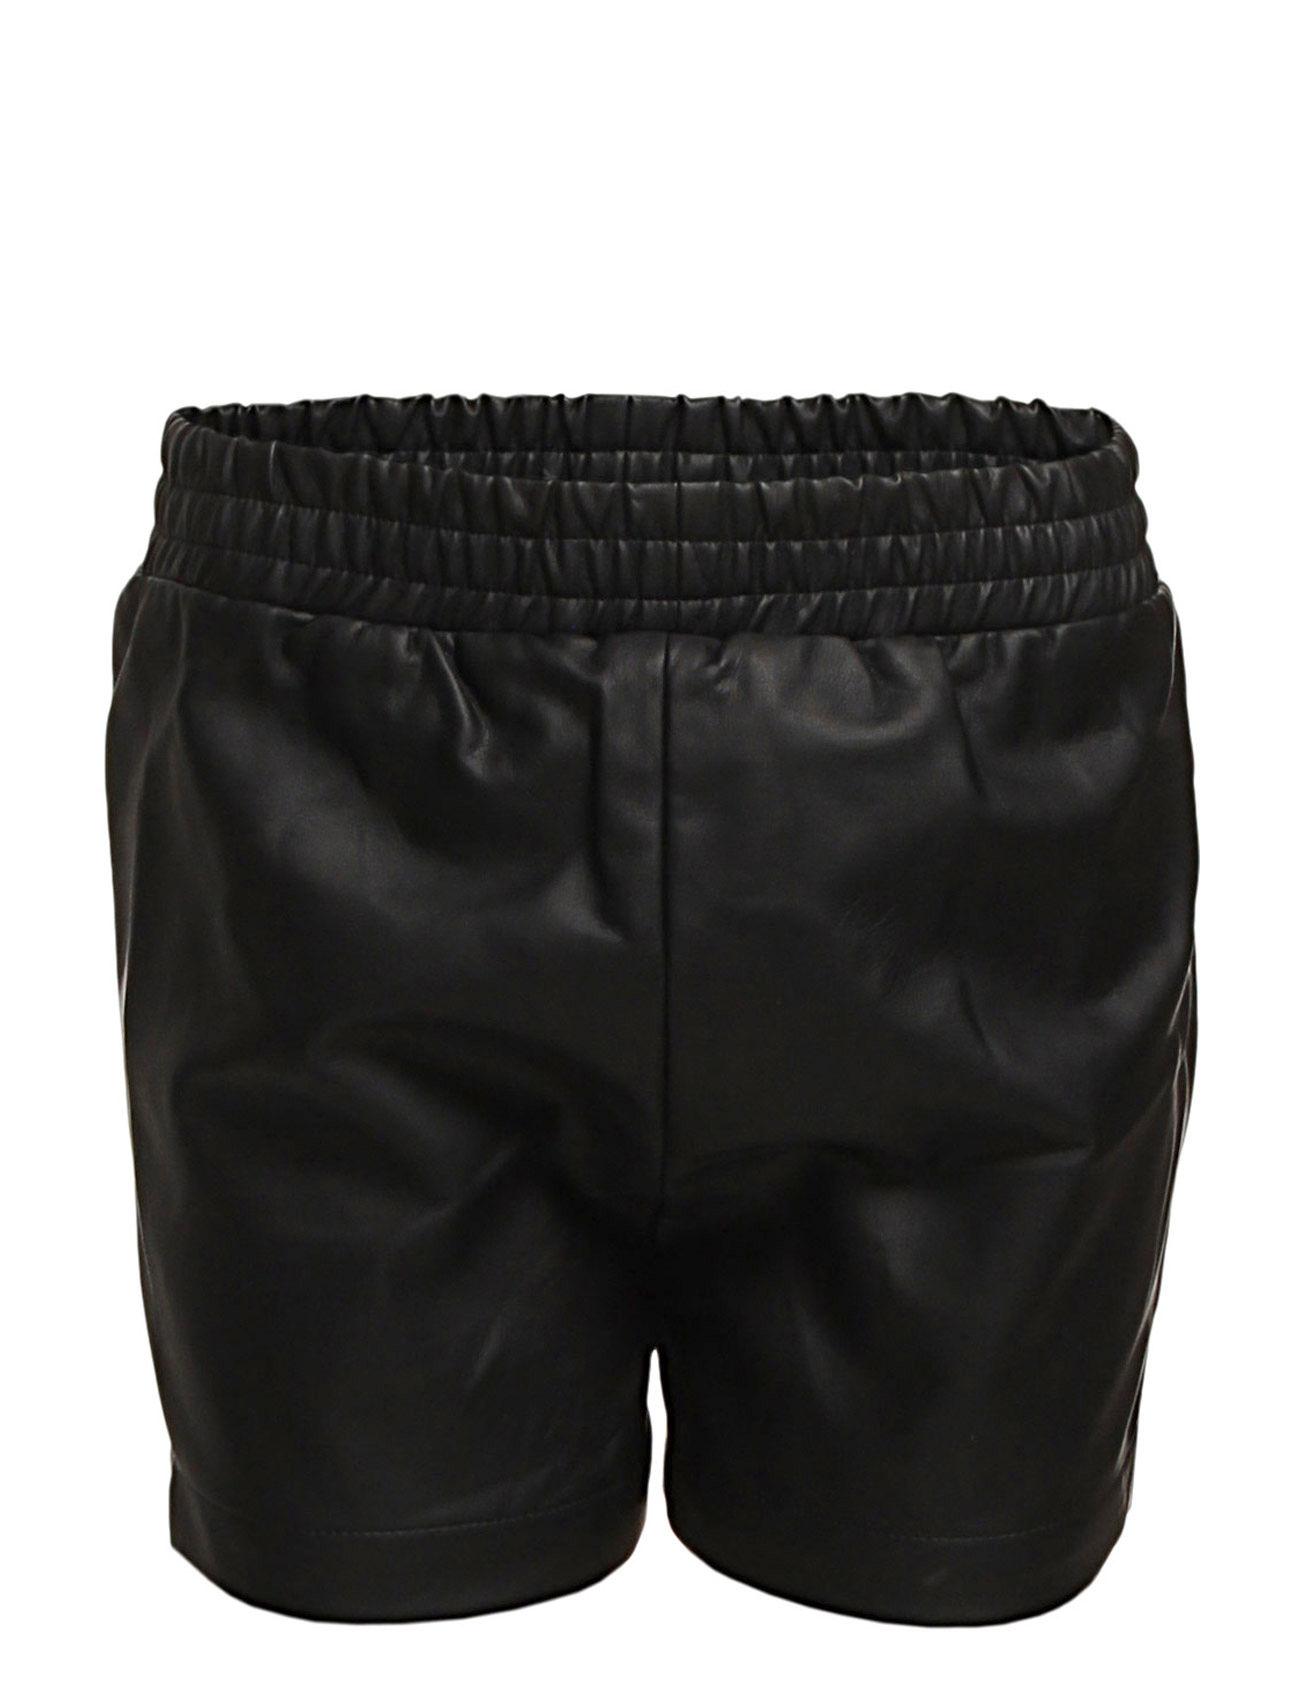 Selma Shop Pu Shorts